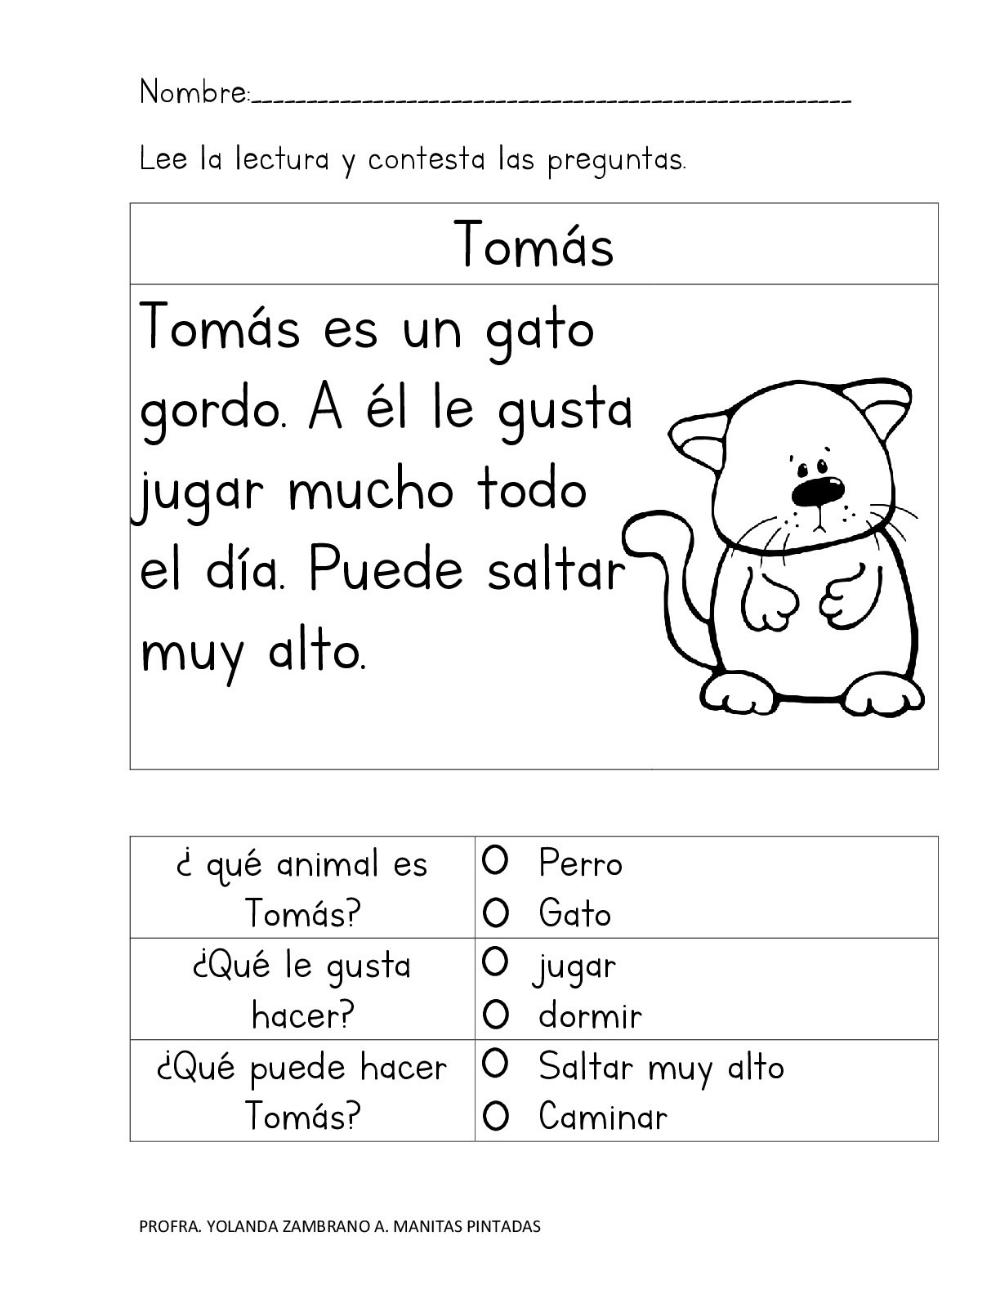 270 Ideas De Hojas Para Imprimir Hojas Para Imprimir Actividades Escolares Primeros Grados